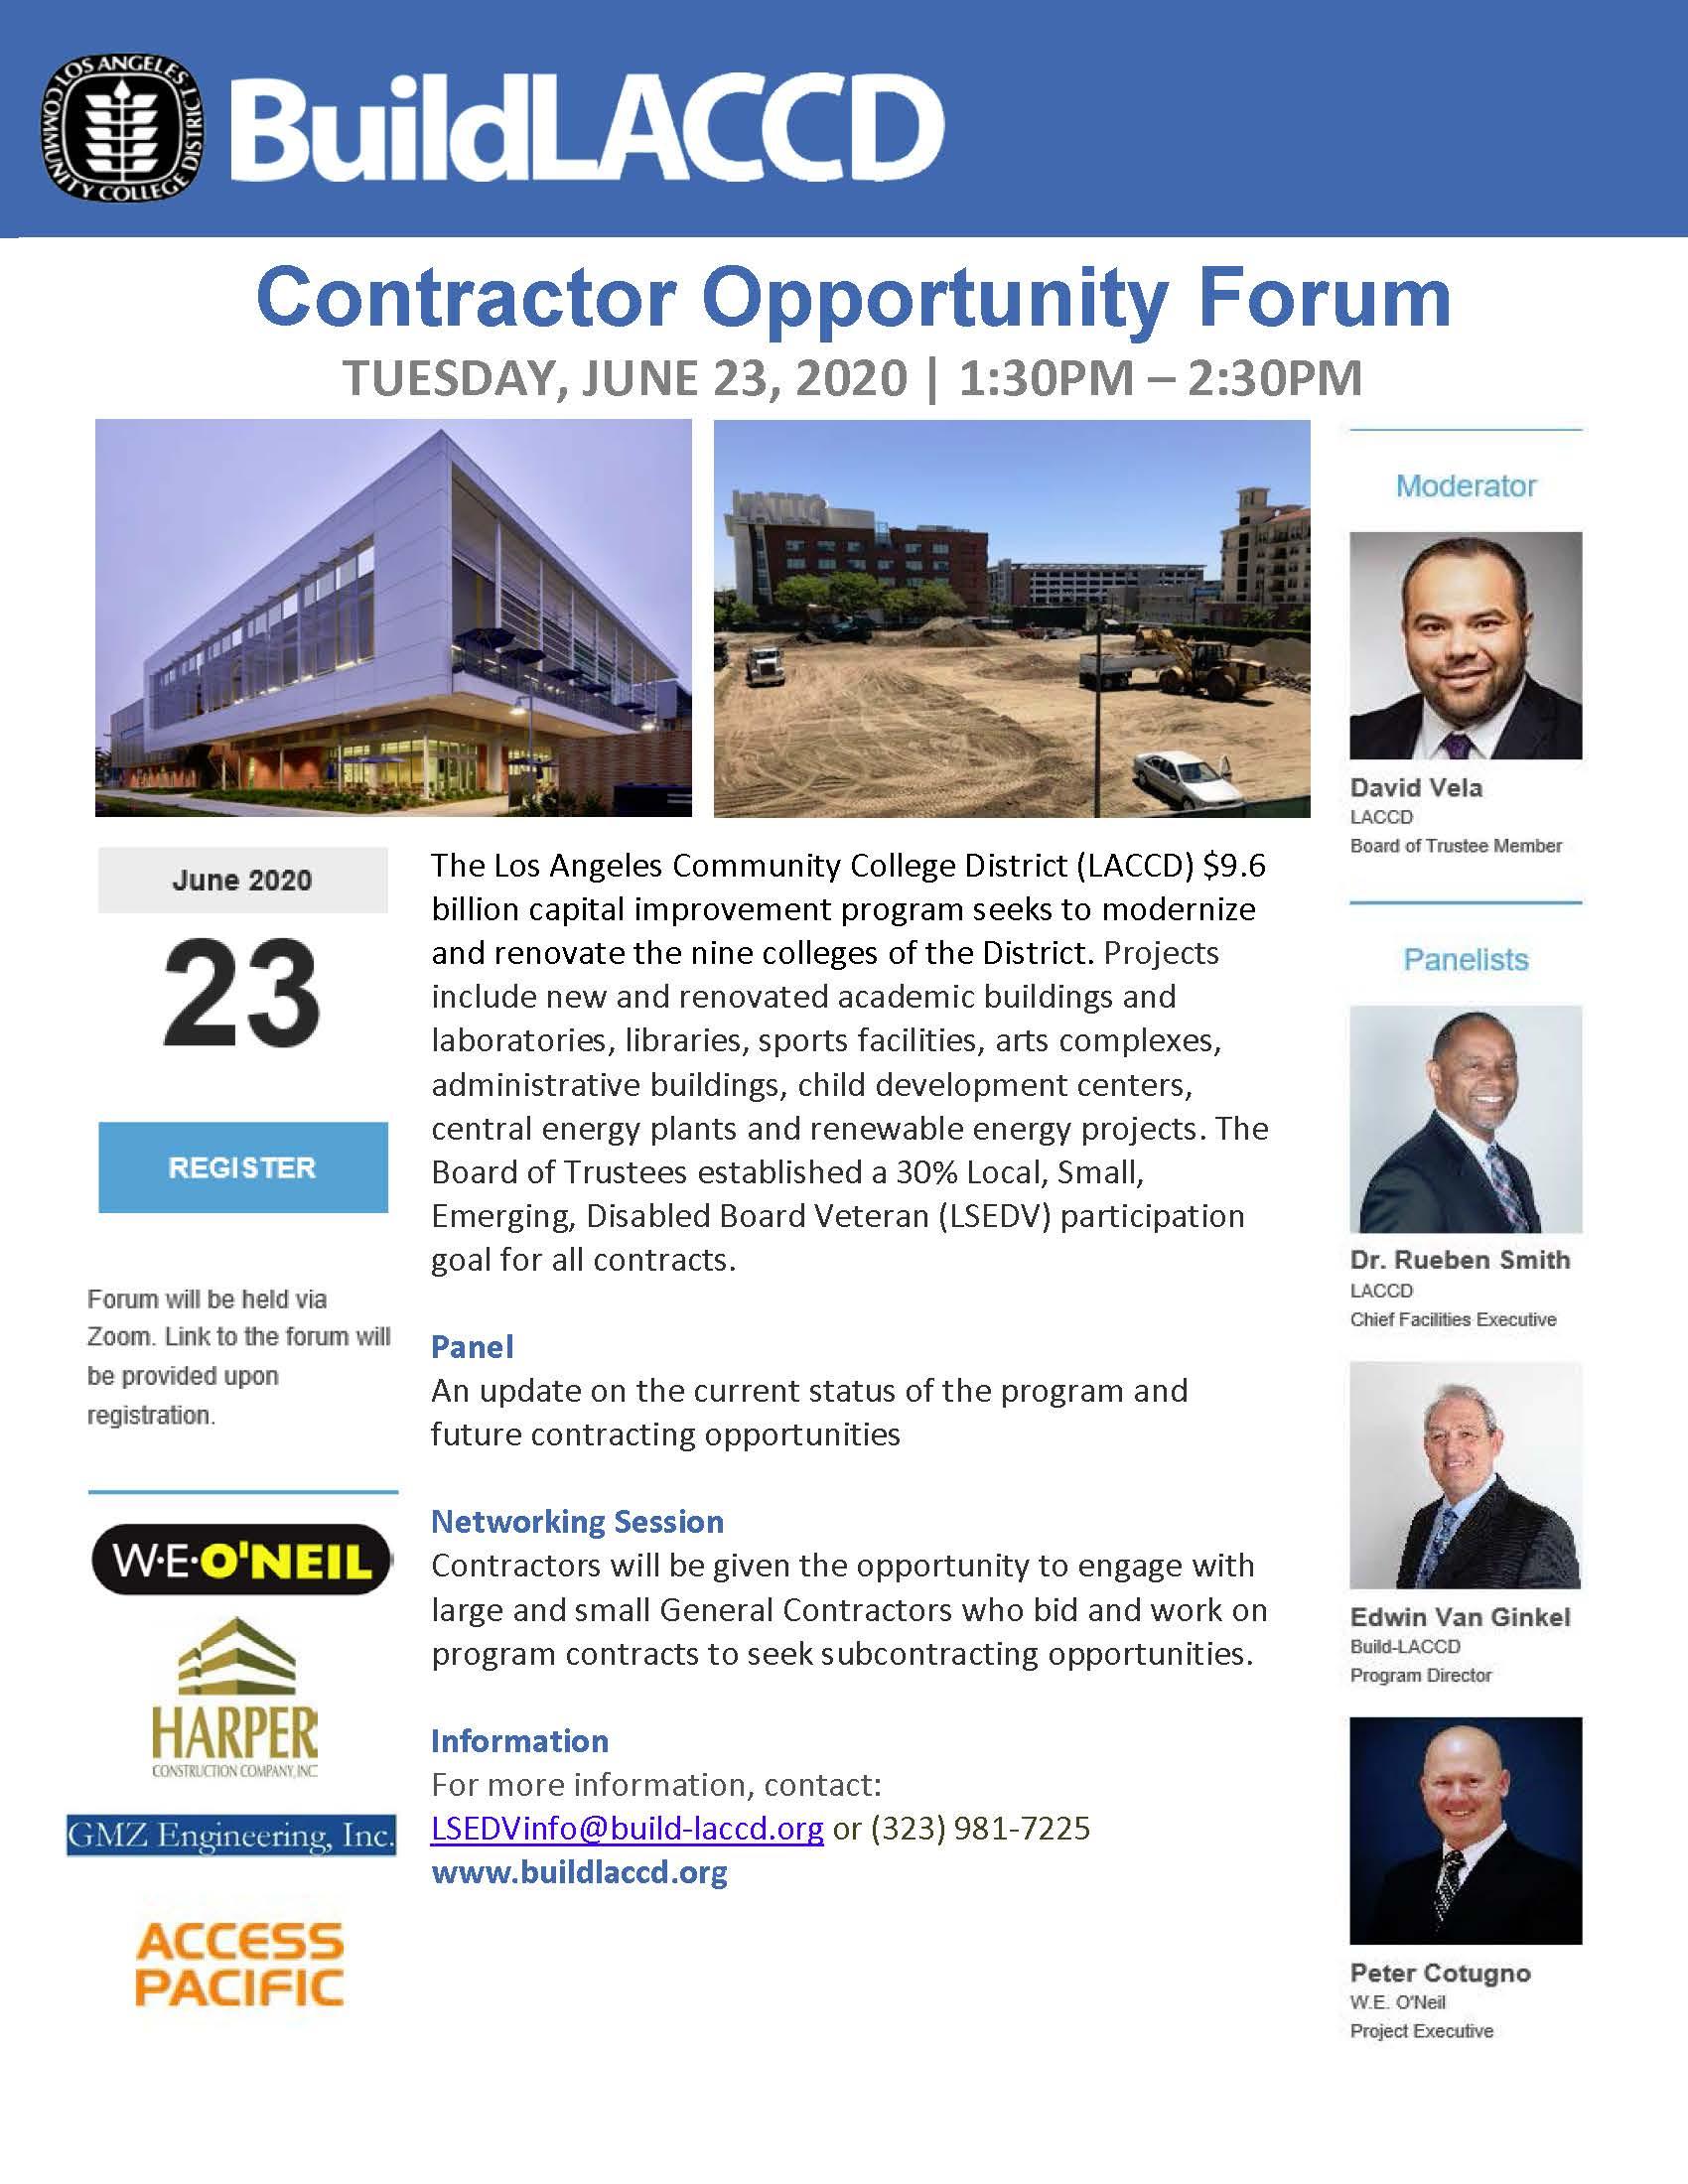 Opportunity Forum Flyer